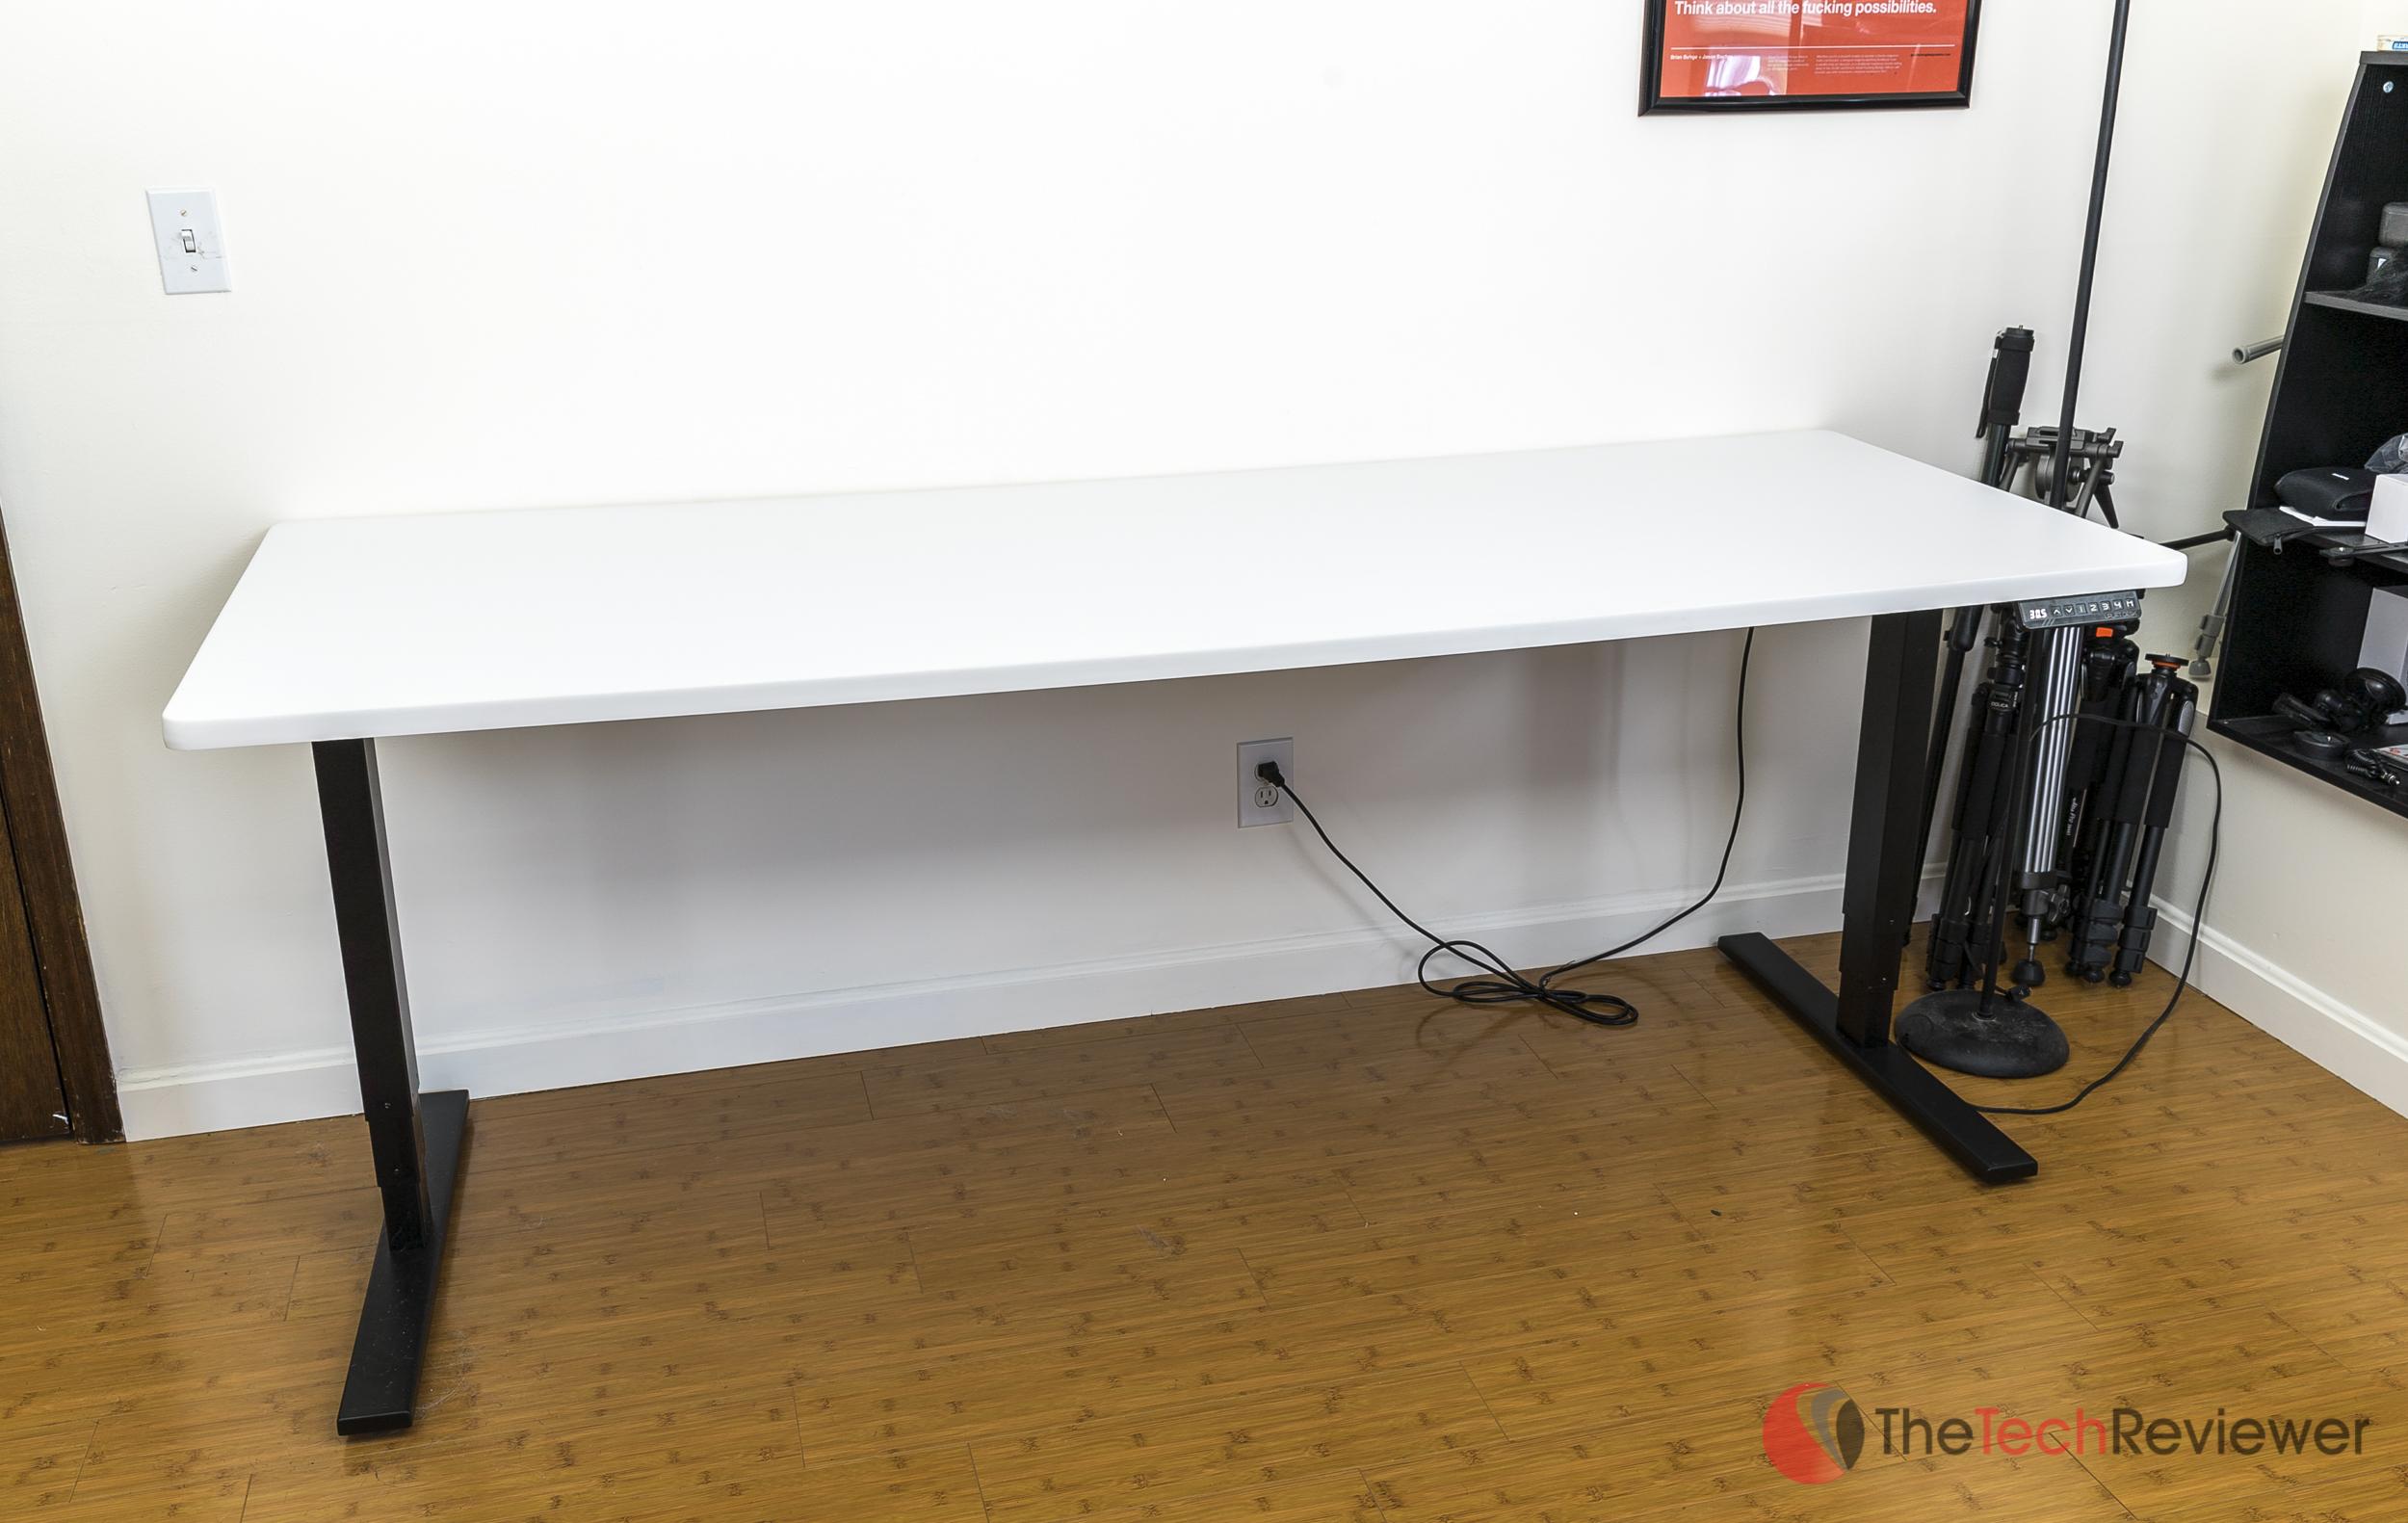 Uplift 900 Sit Stand Ergonomic Desk Review Worth It